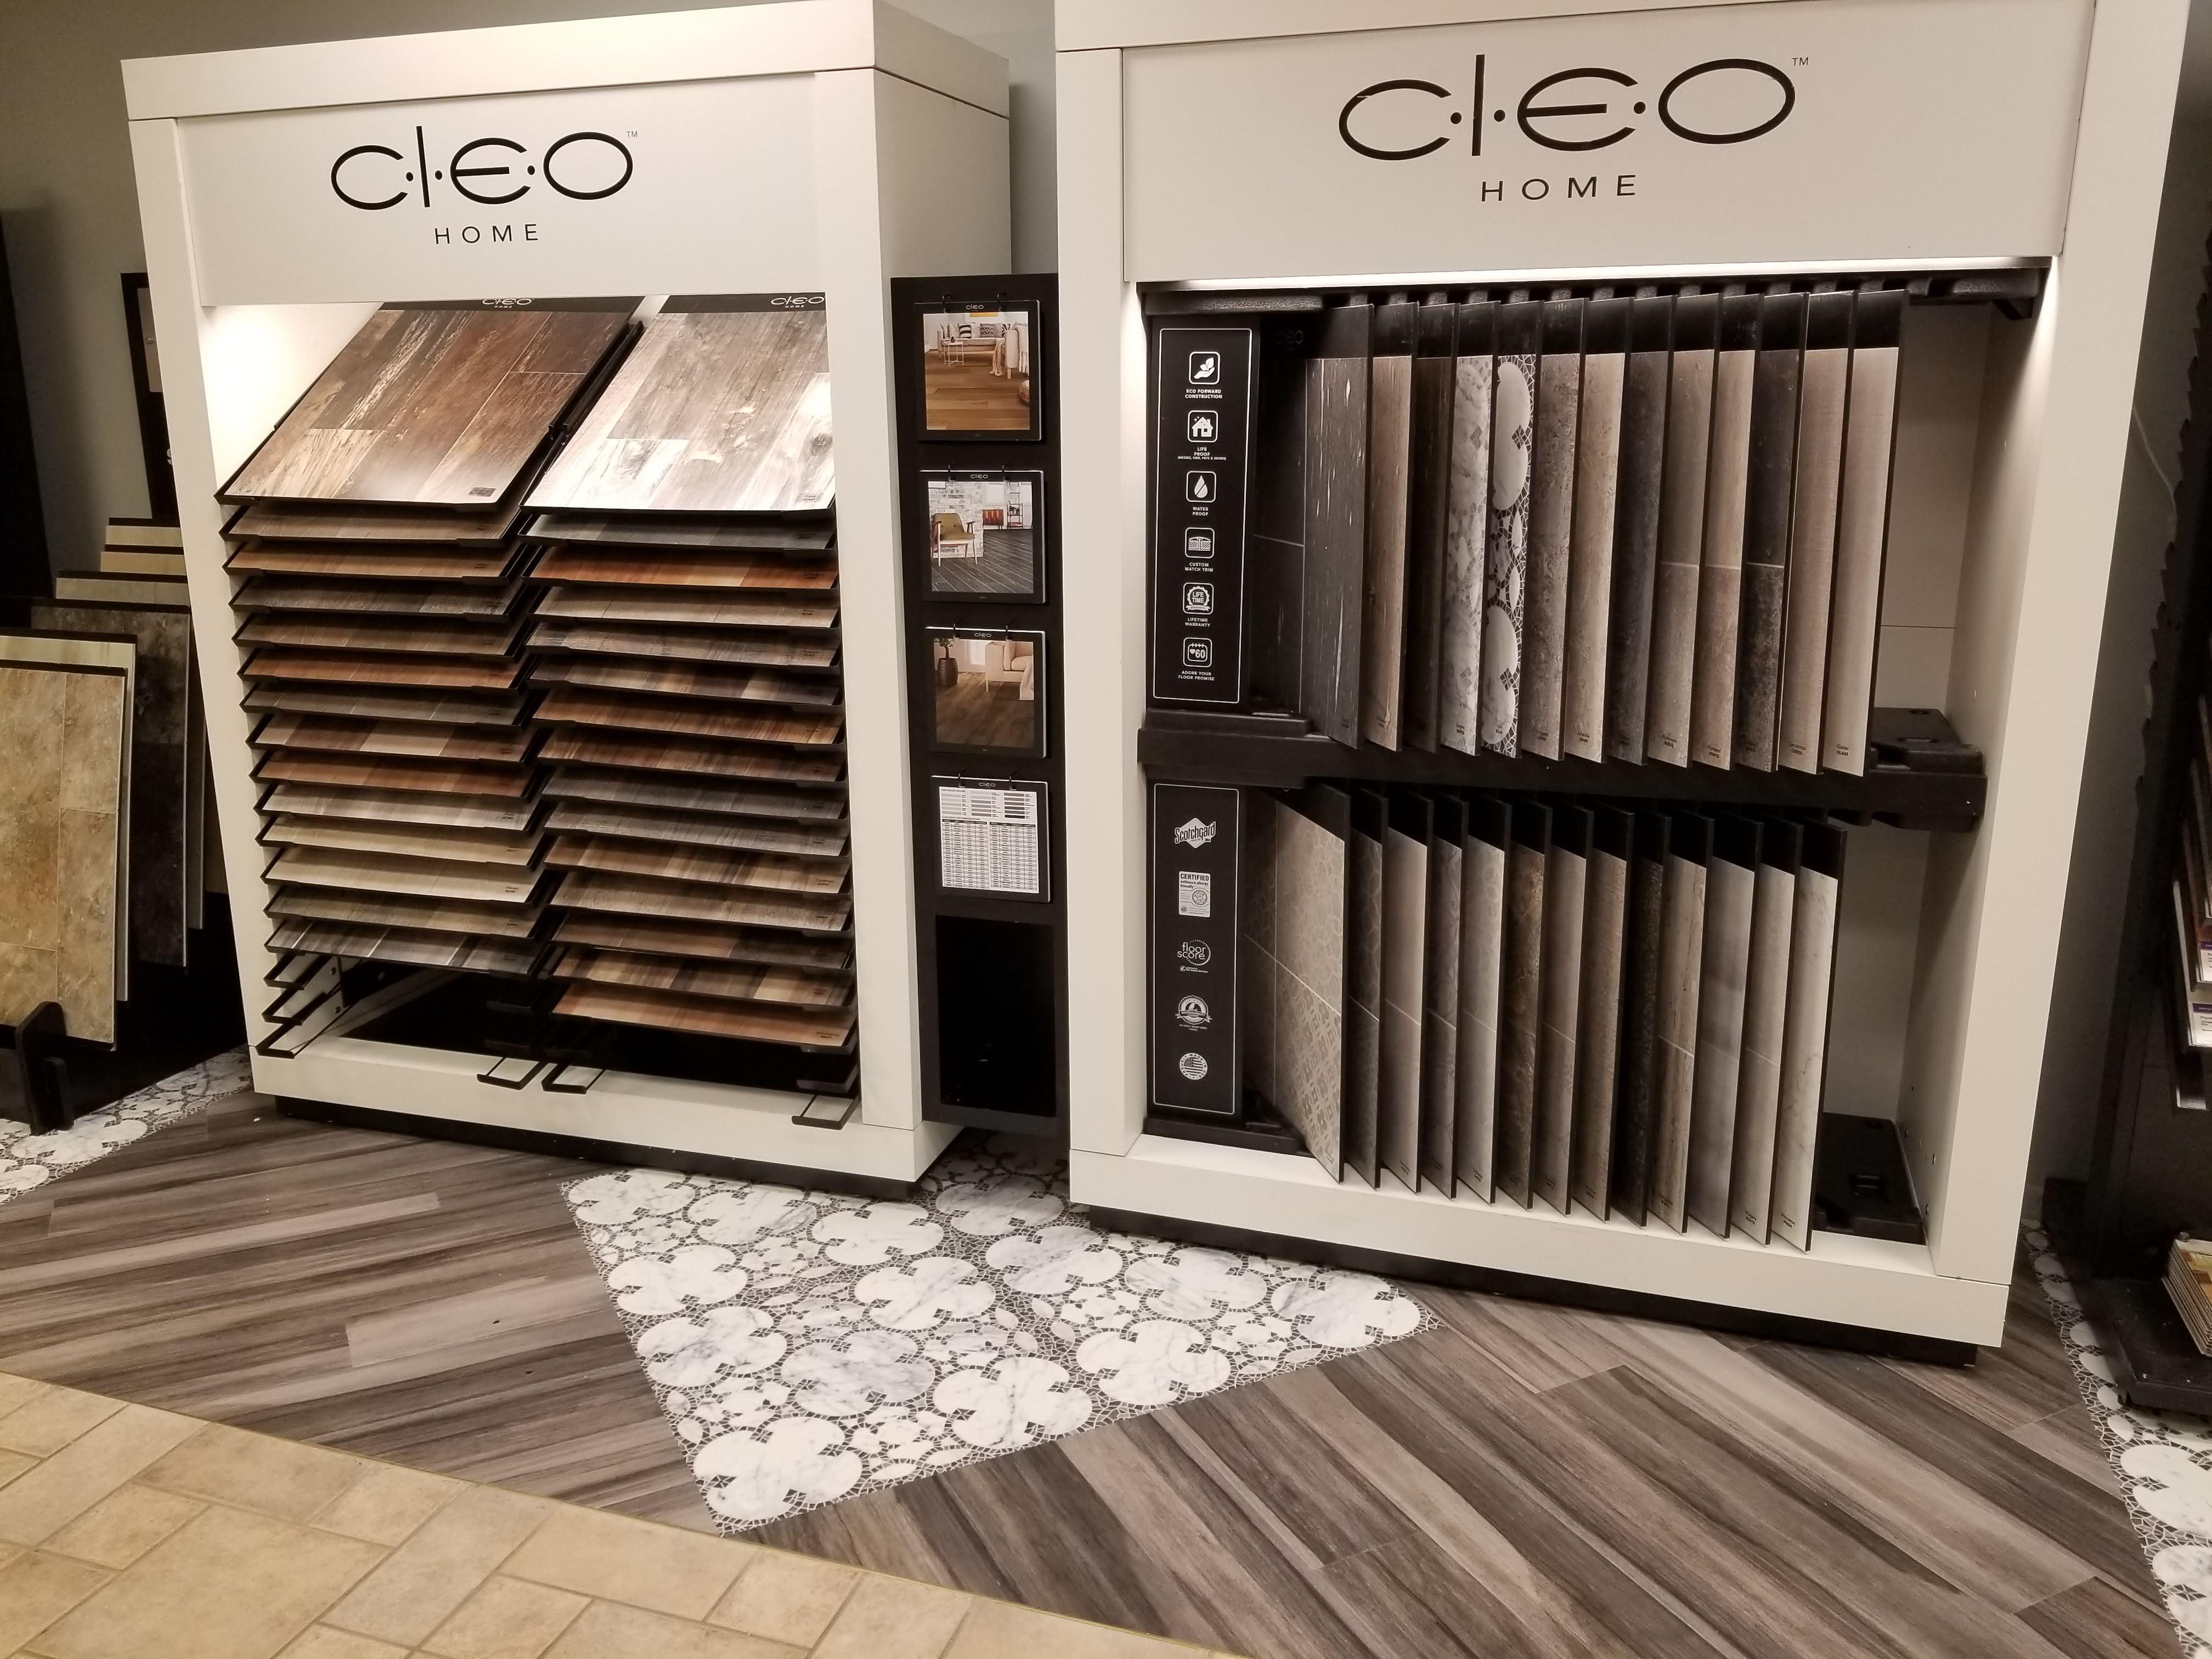 Congoleum Cleo Flooring Display